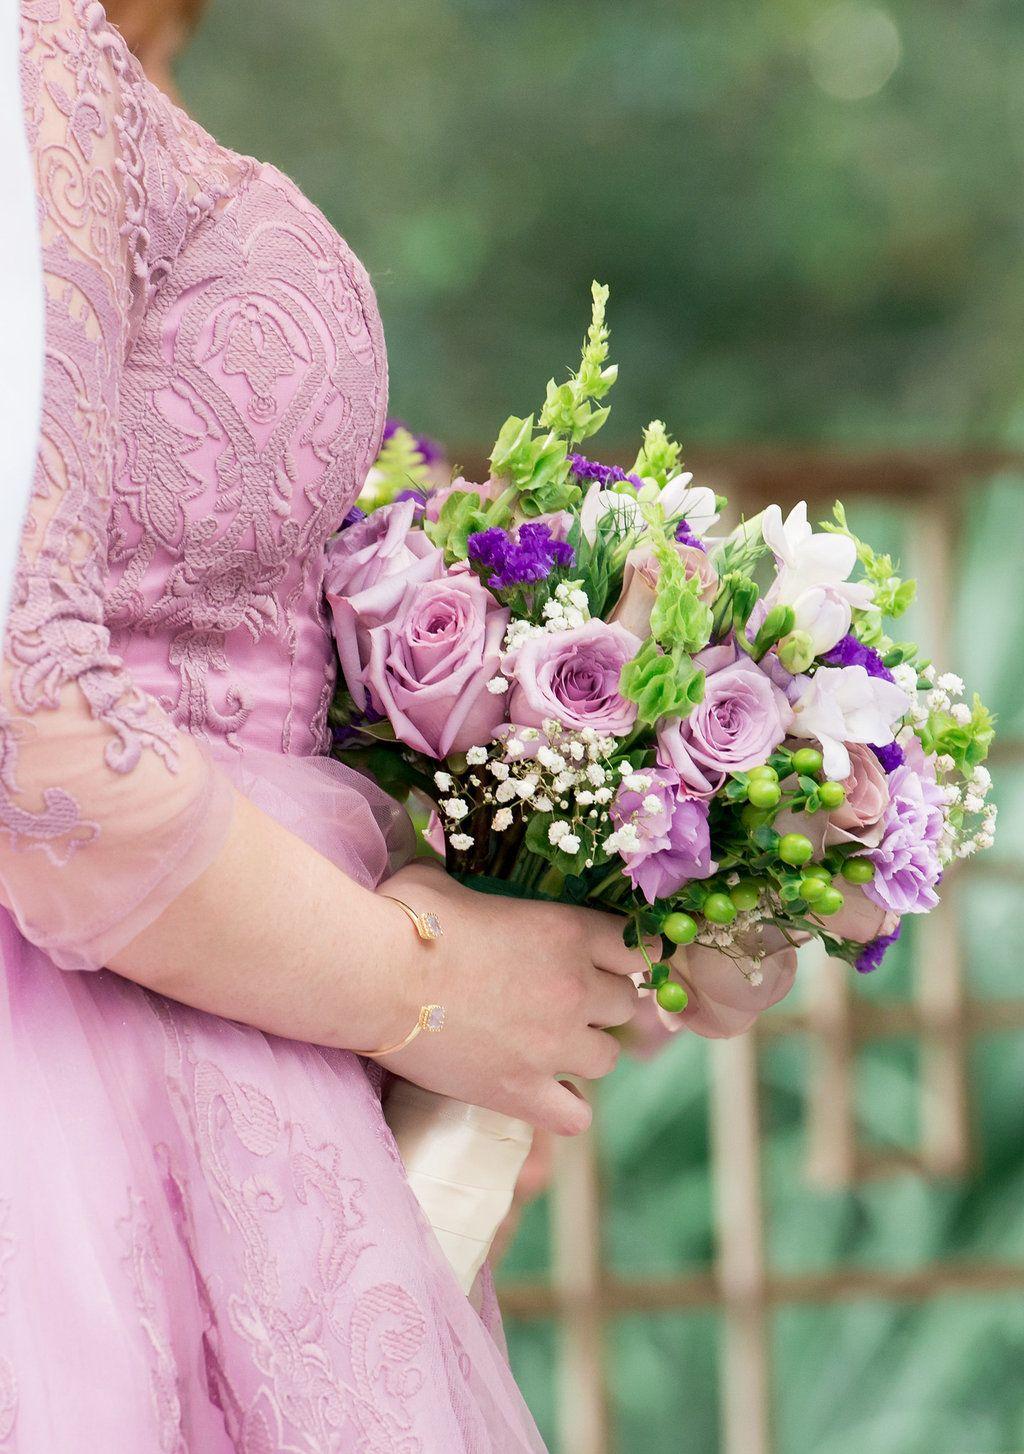 Outdoor wedding purple flower bouquet by lemon drops lemon drops purple flower bouquet by lemon drops izmirmasajfo